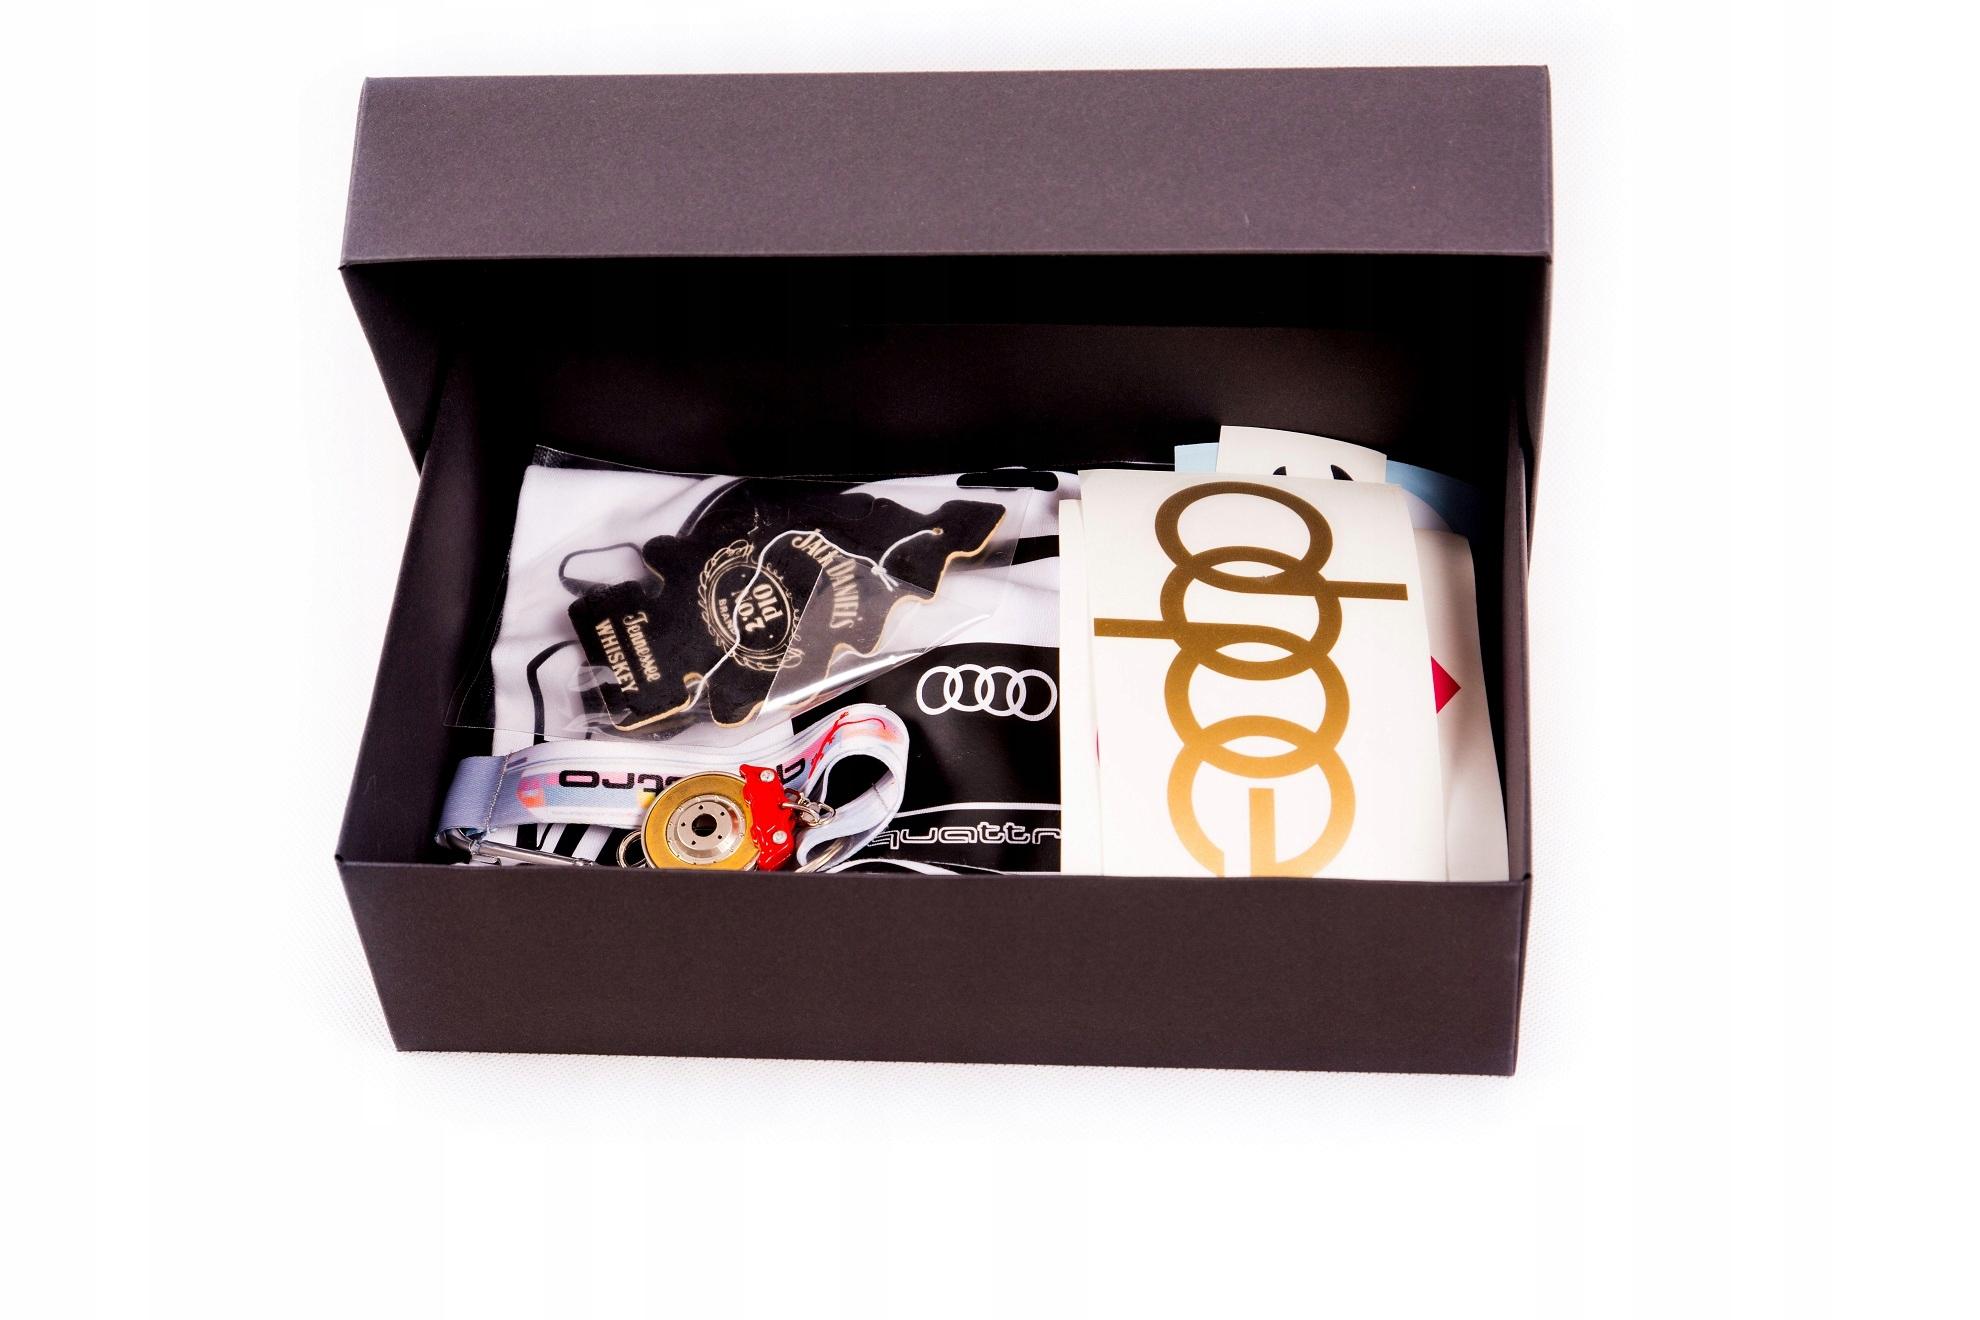 Подарочная коробка: наклейки, брелок, футболка Audi RS6